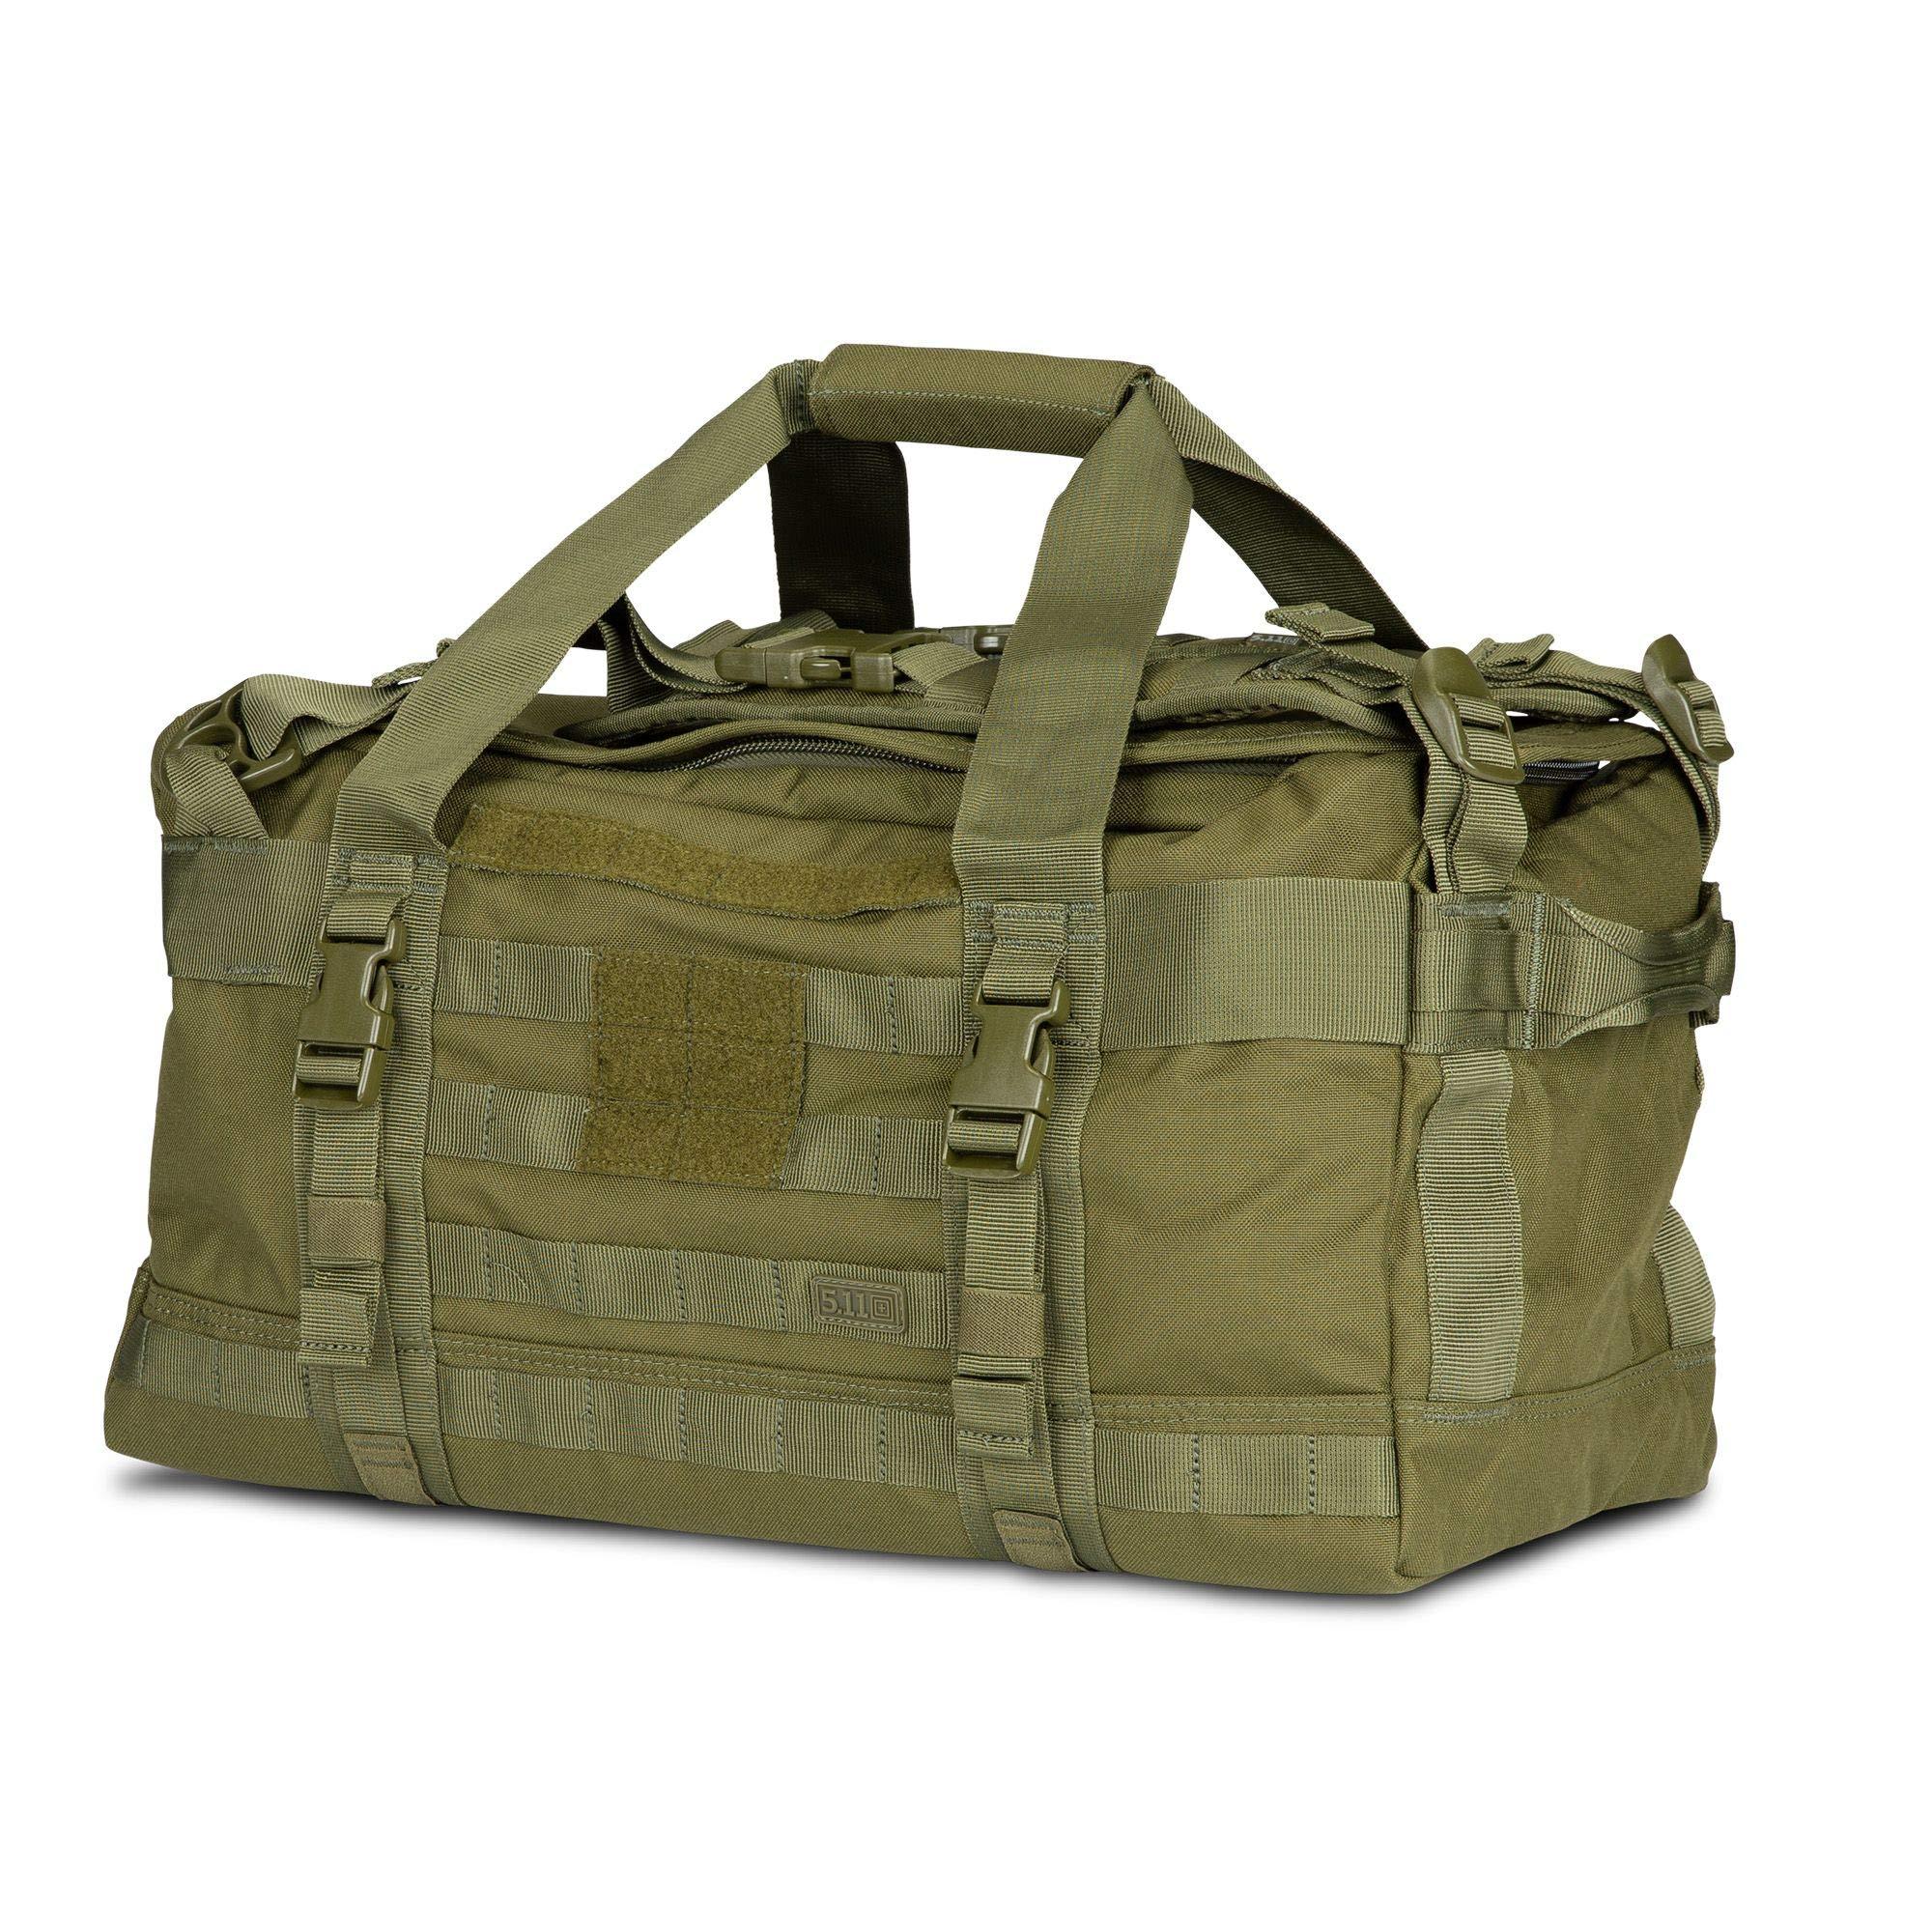 5.11 Rush LBD Mike Molle Tactical Duffel Bag